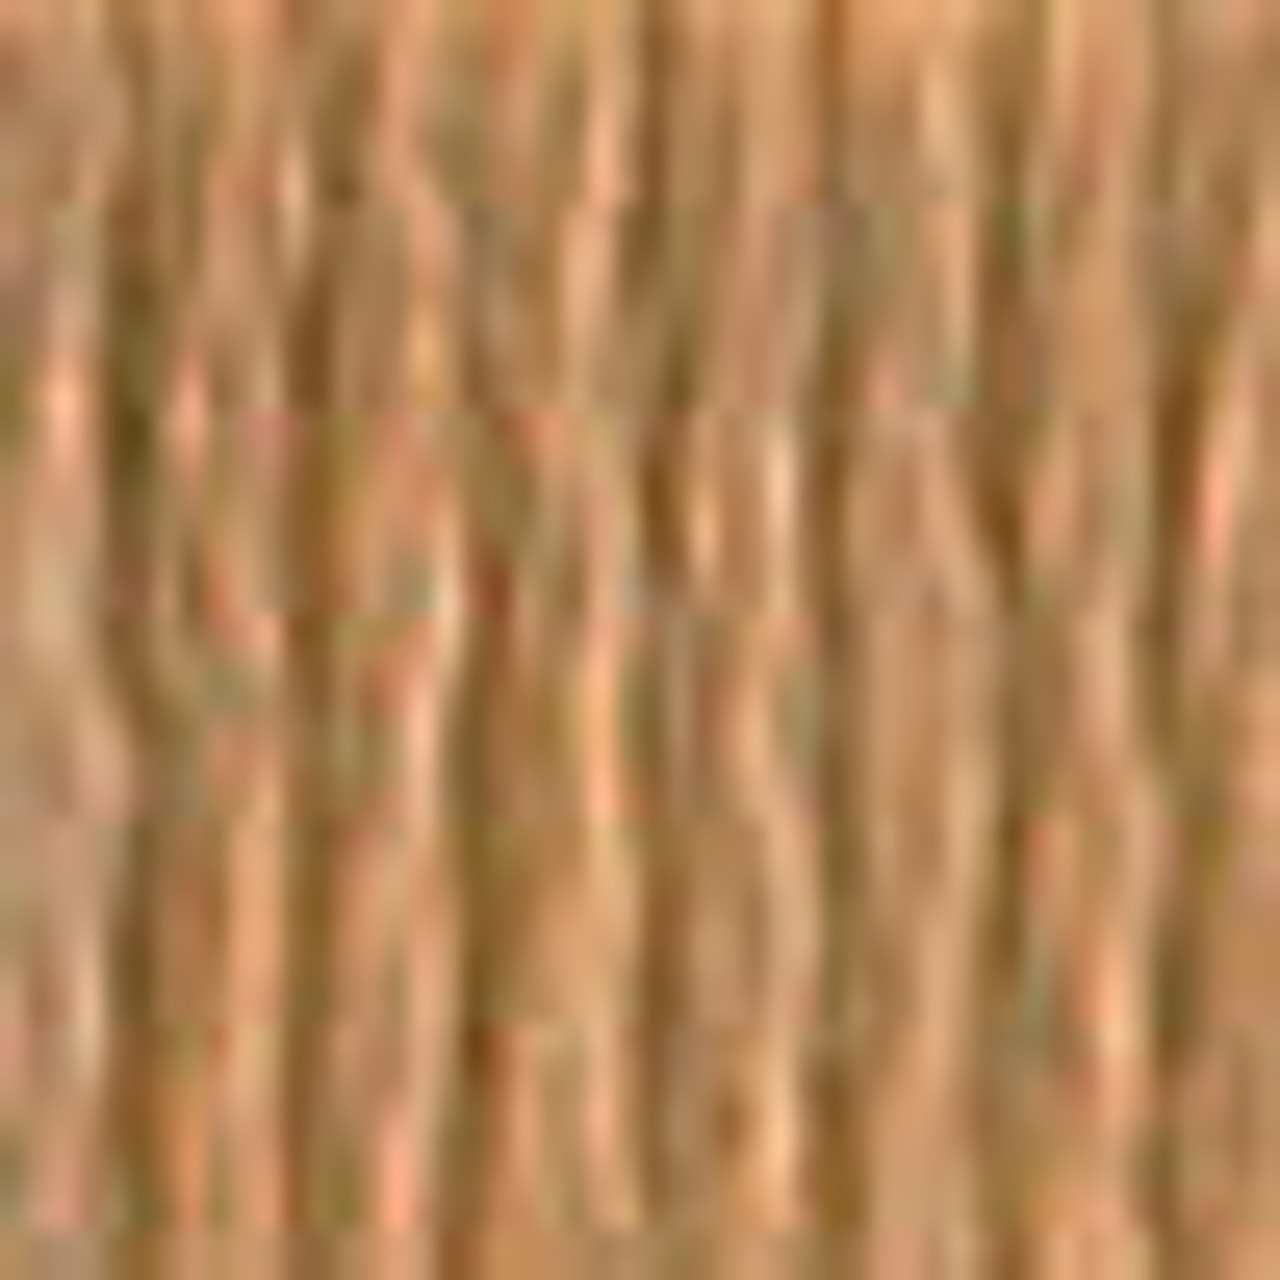 DMC # 3828 Hazelnut Brown Floss / Thread